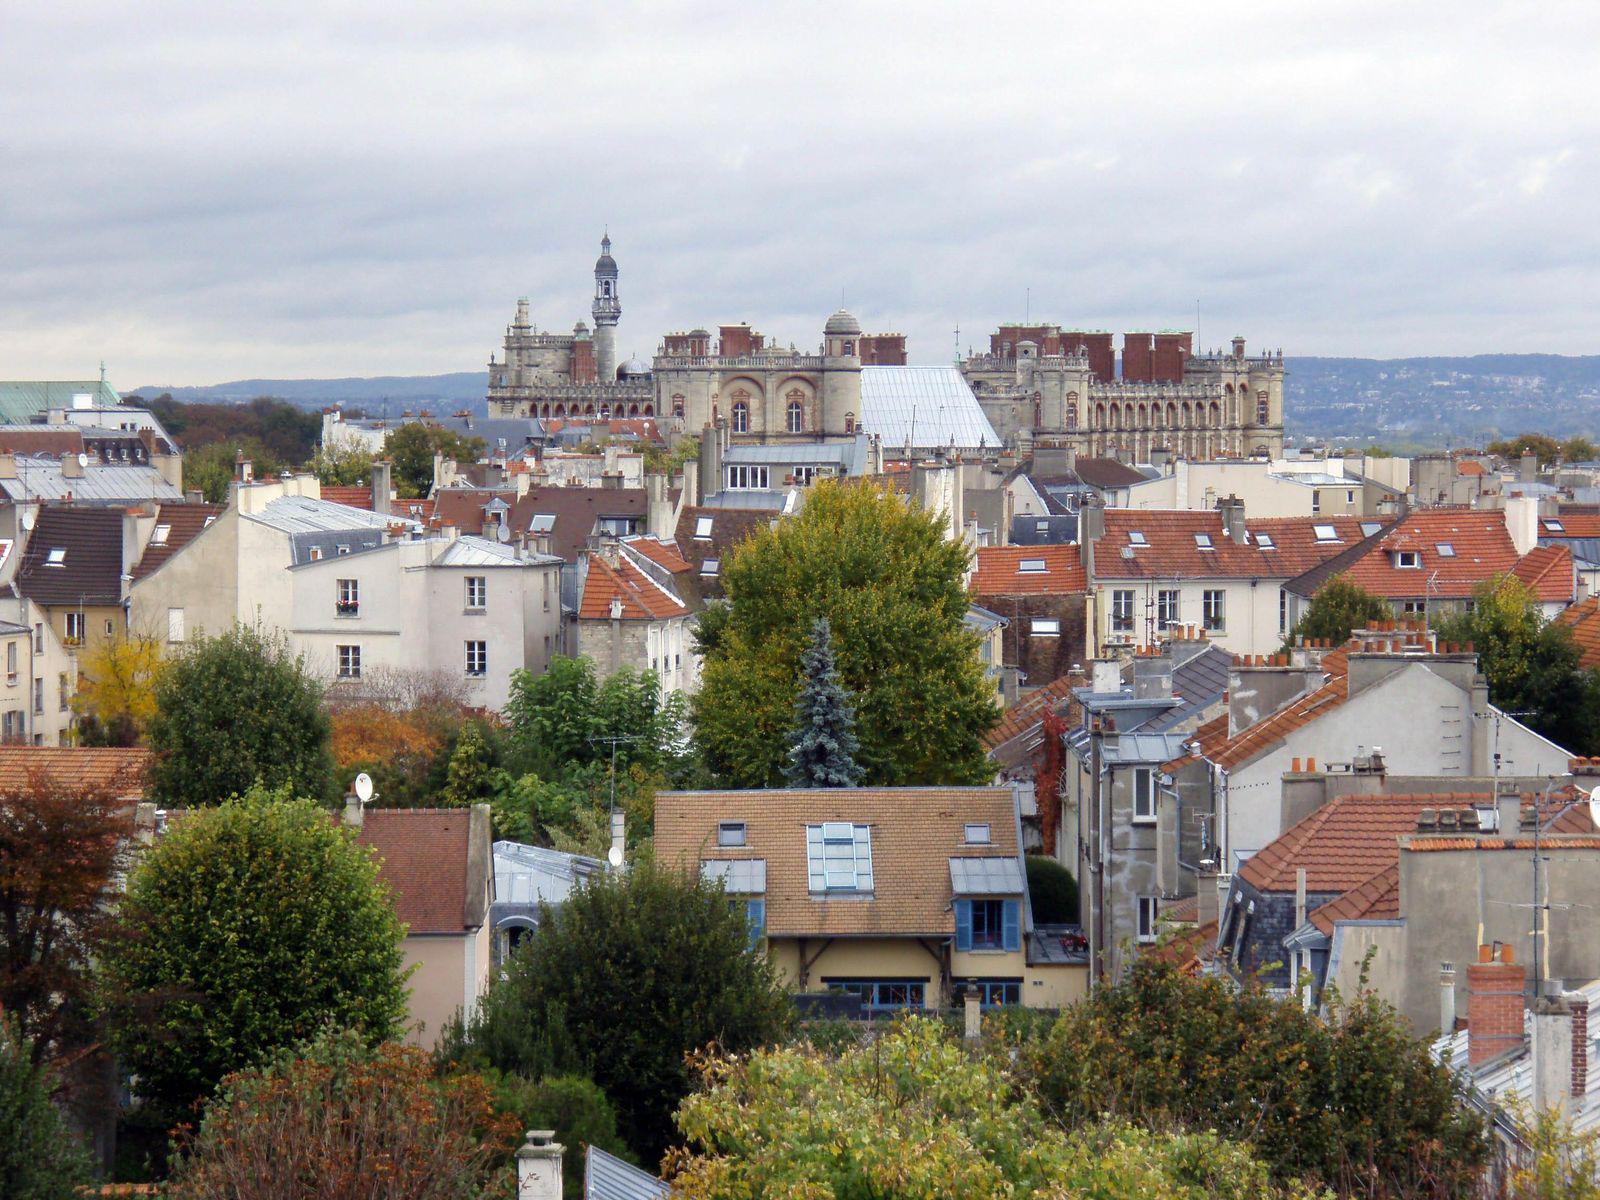 Saint-Germain-en-Laye (1)